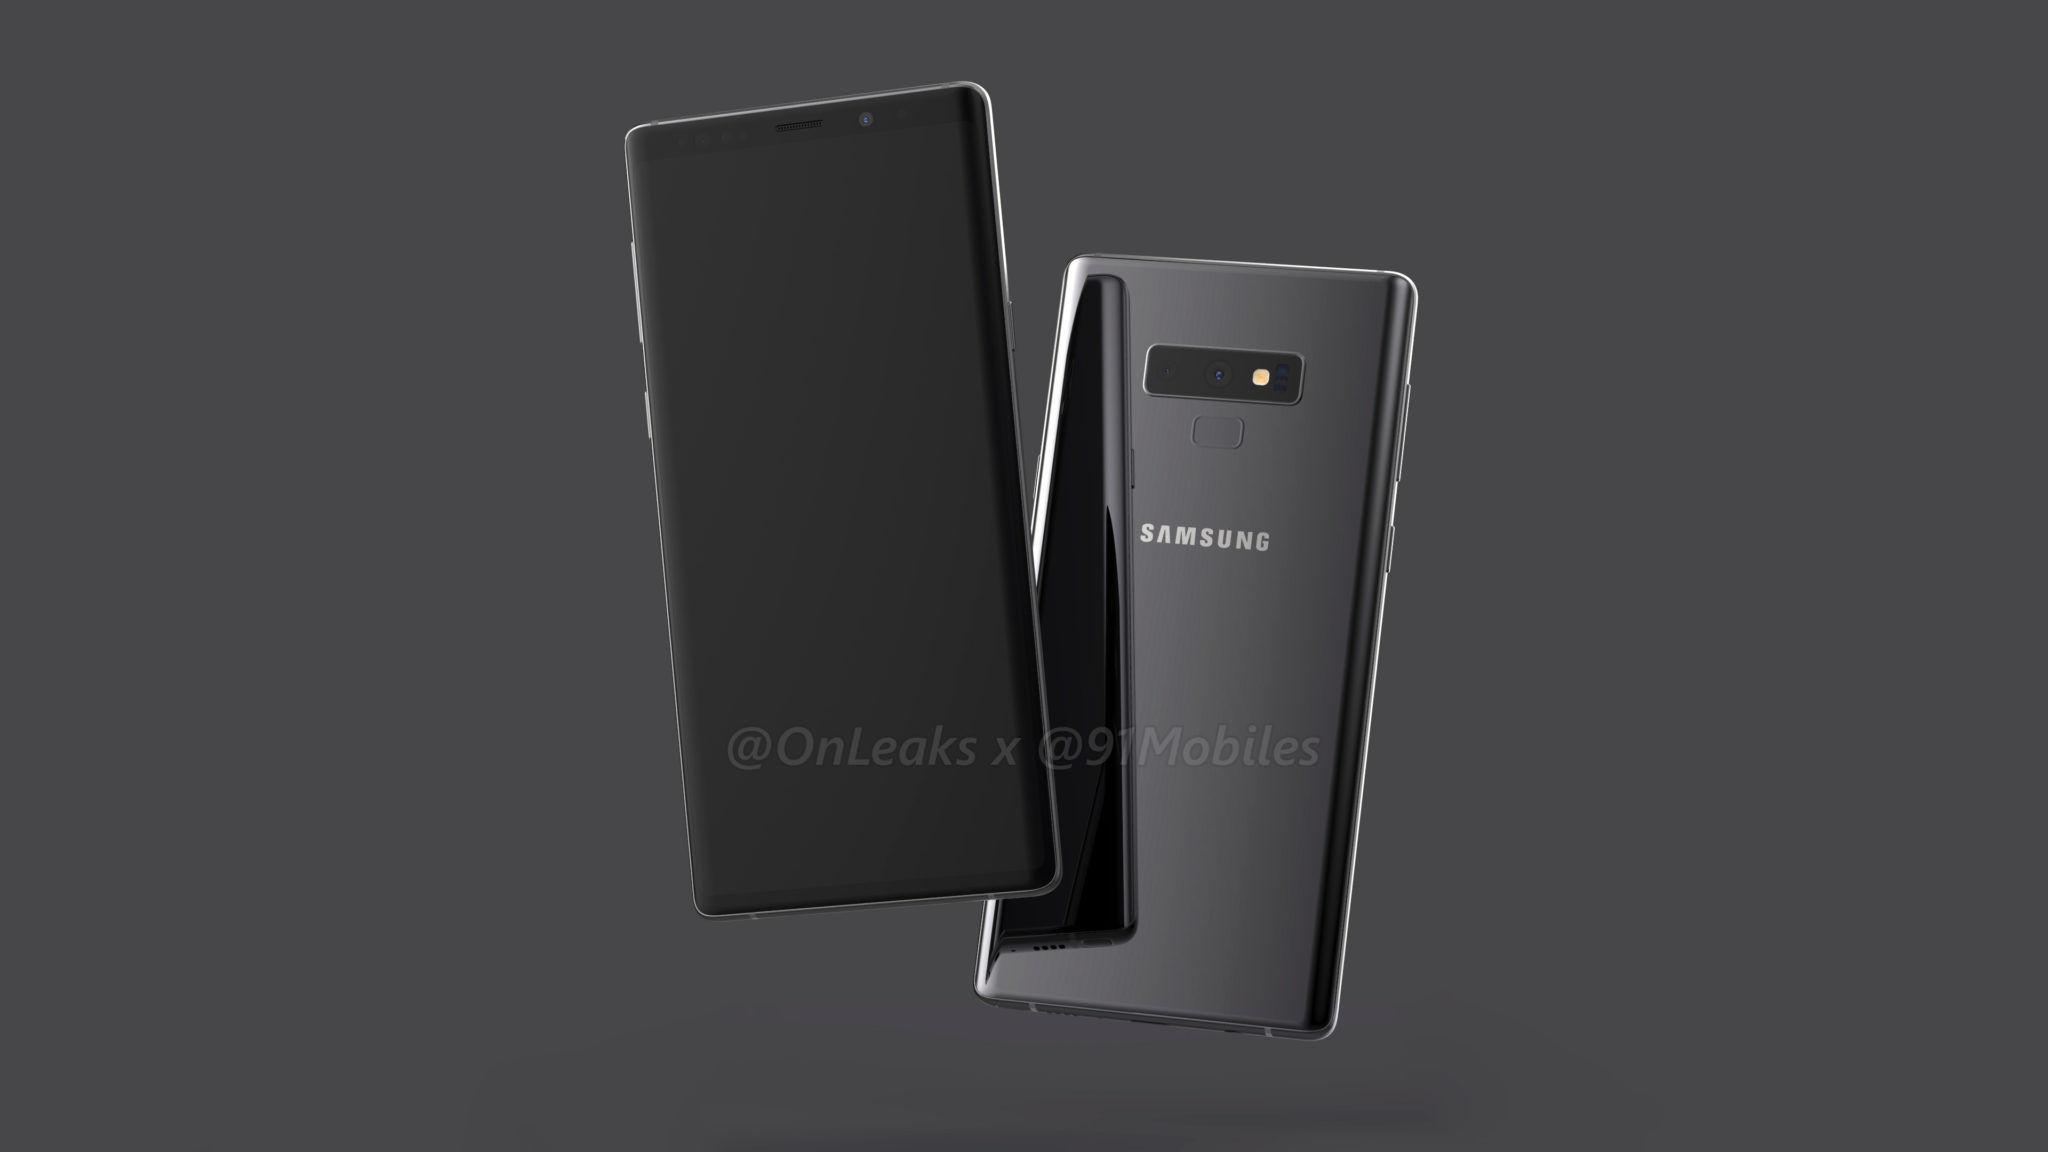 Samsung Galaxy Note 9 4k render - 91mobiles (4)